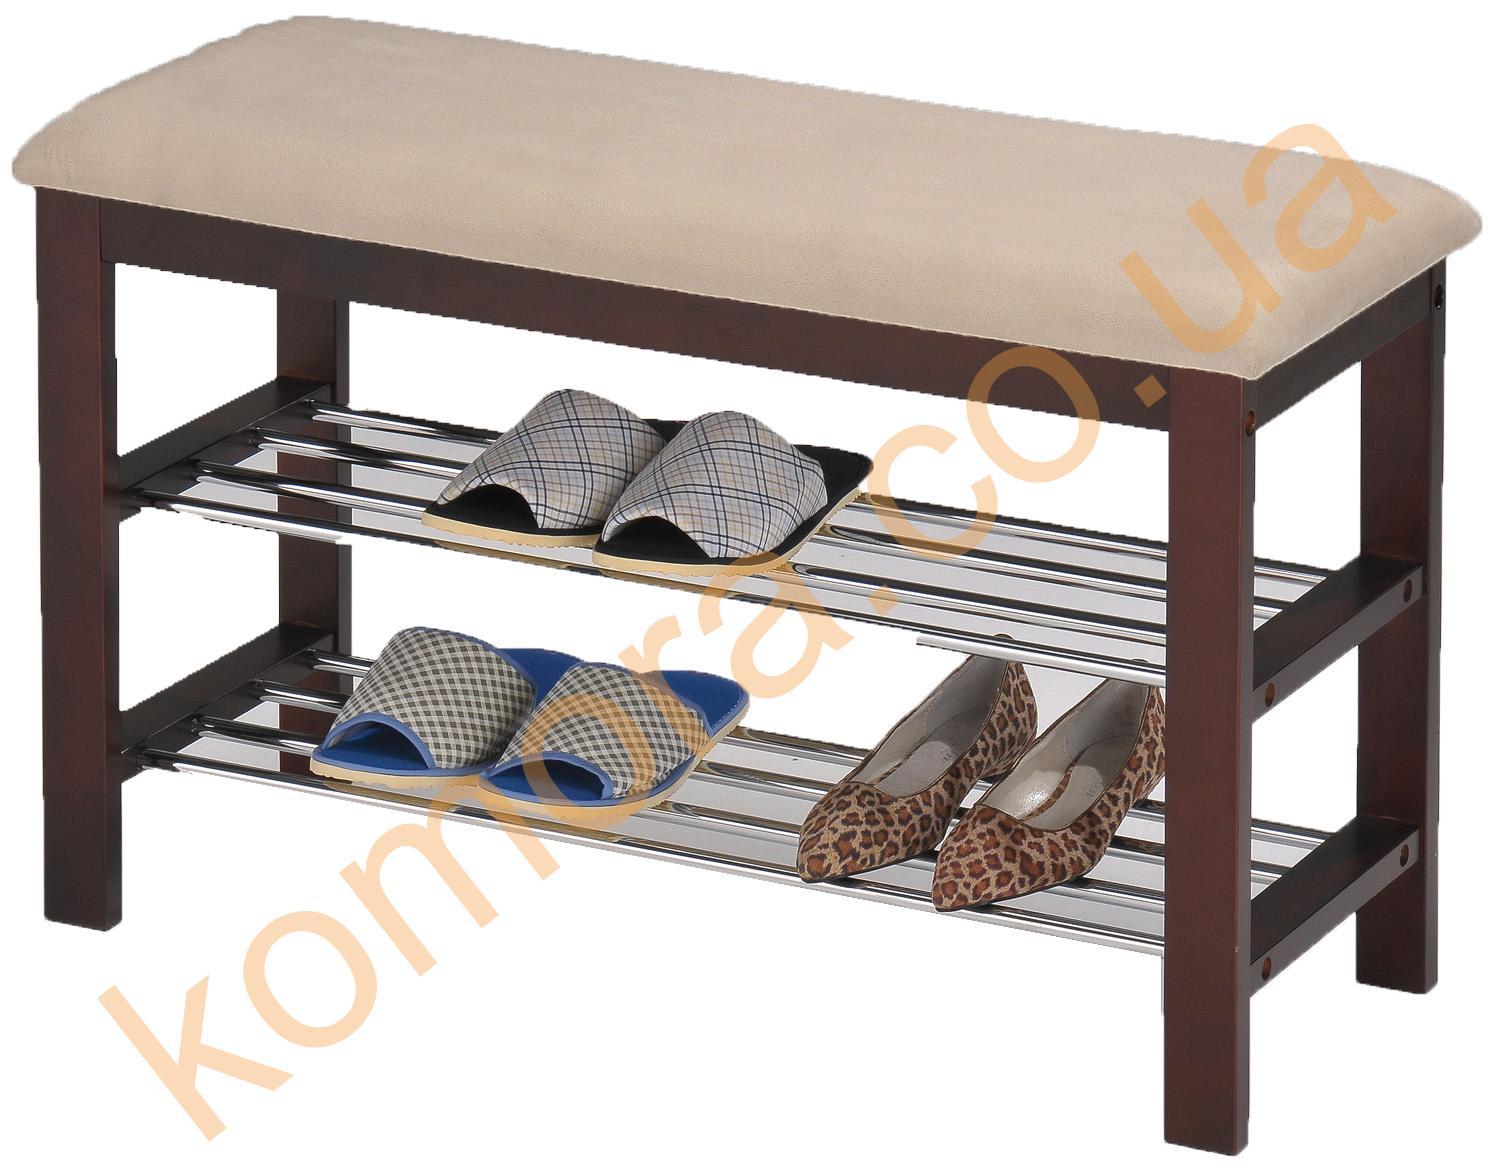 Полиця для взуття W 09 – купити банкетки лавки для взуття Київ 4942eef1827bd